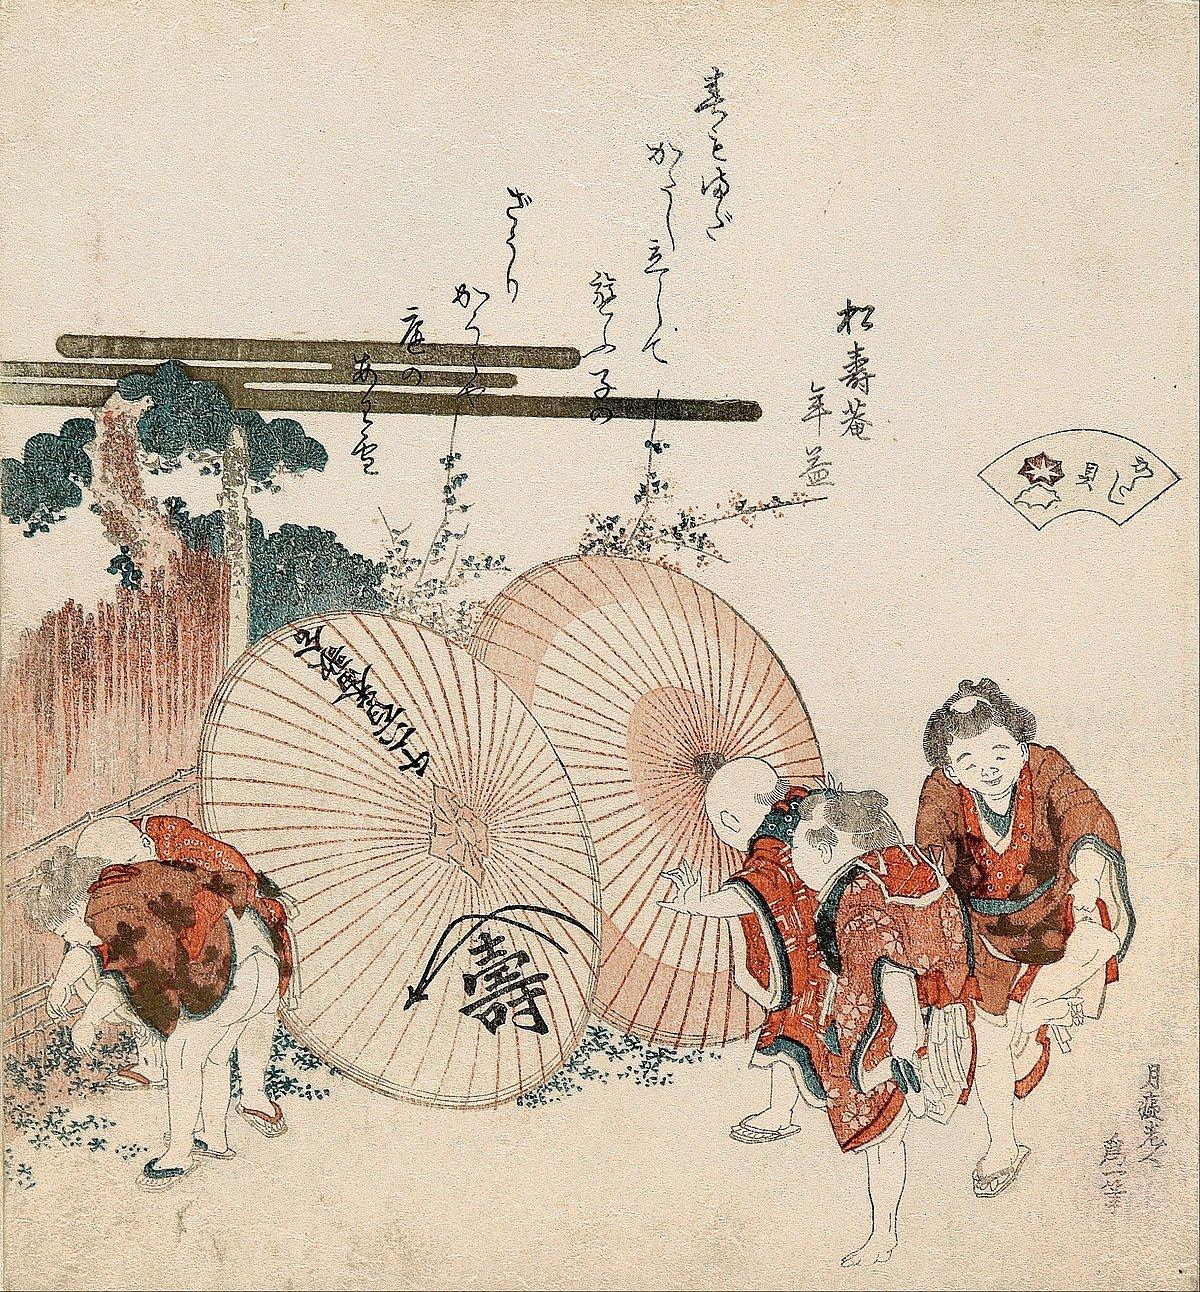 JAPAN ART  ⛩ - Page 5 DVNQ5KDVQAEhm3g